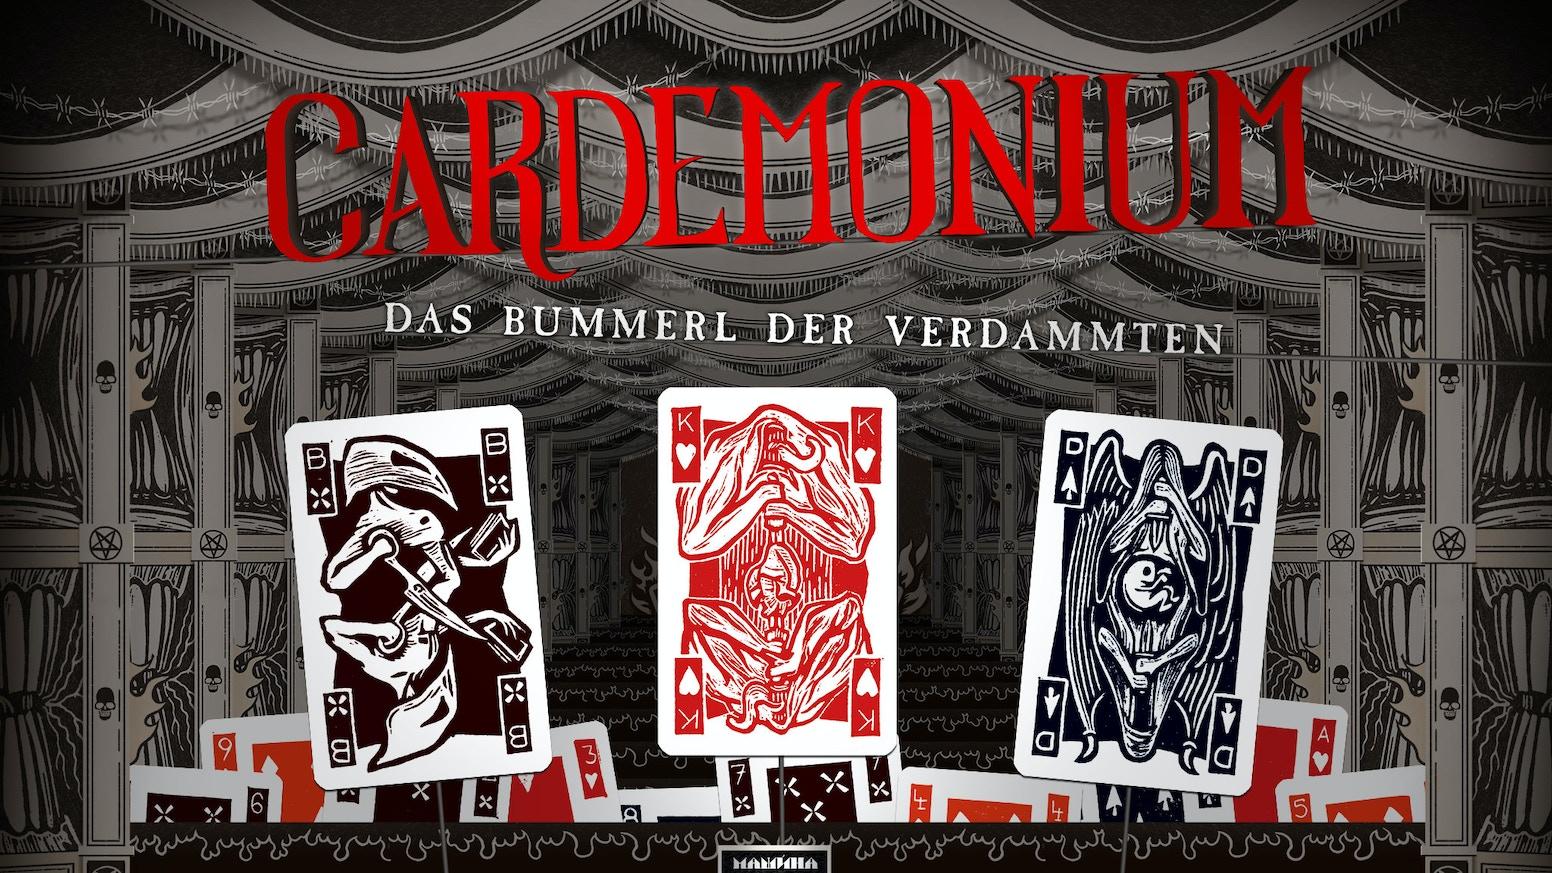 55 poker cards. 666% evil!